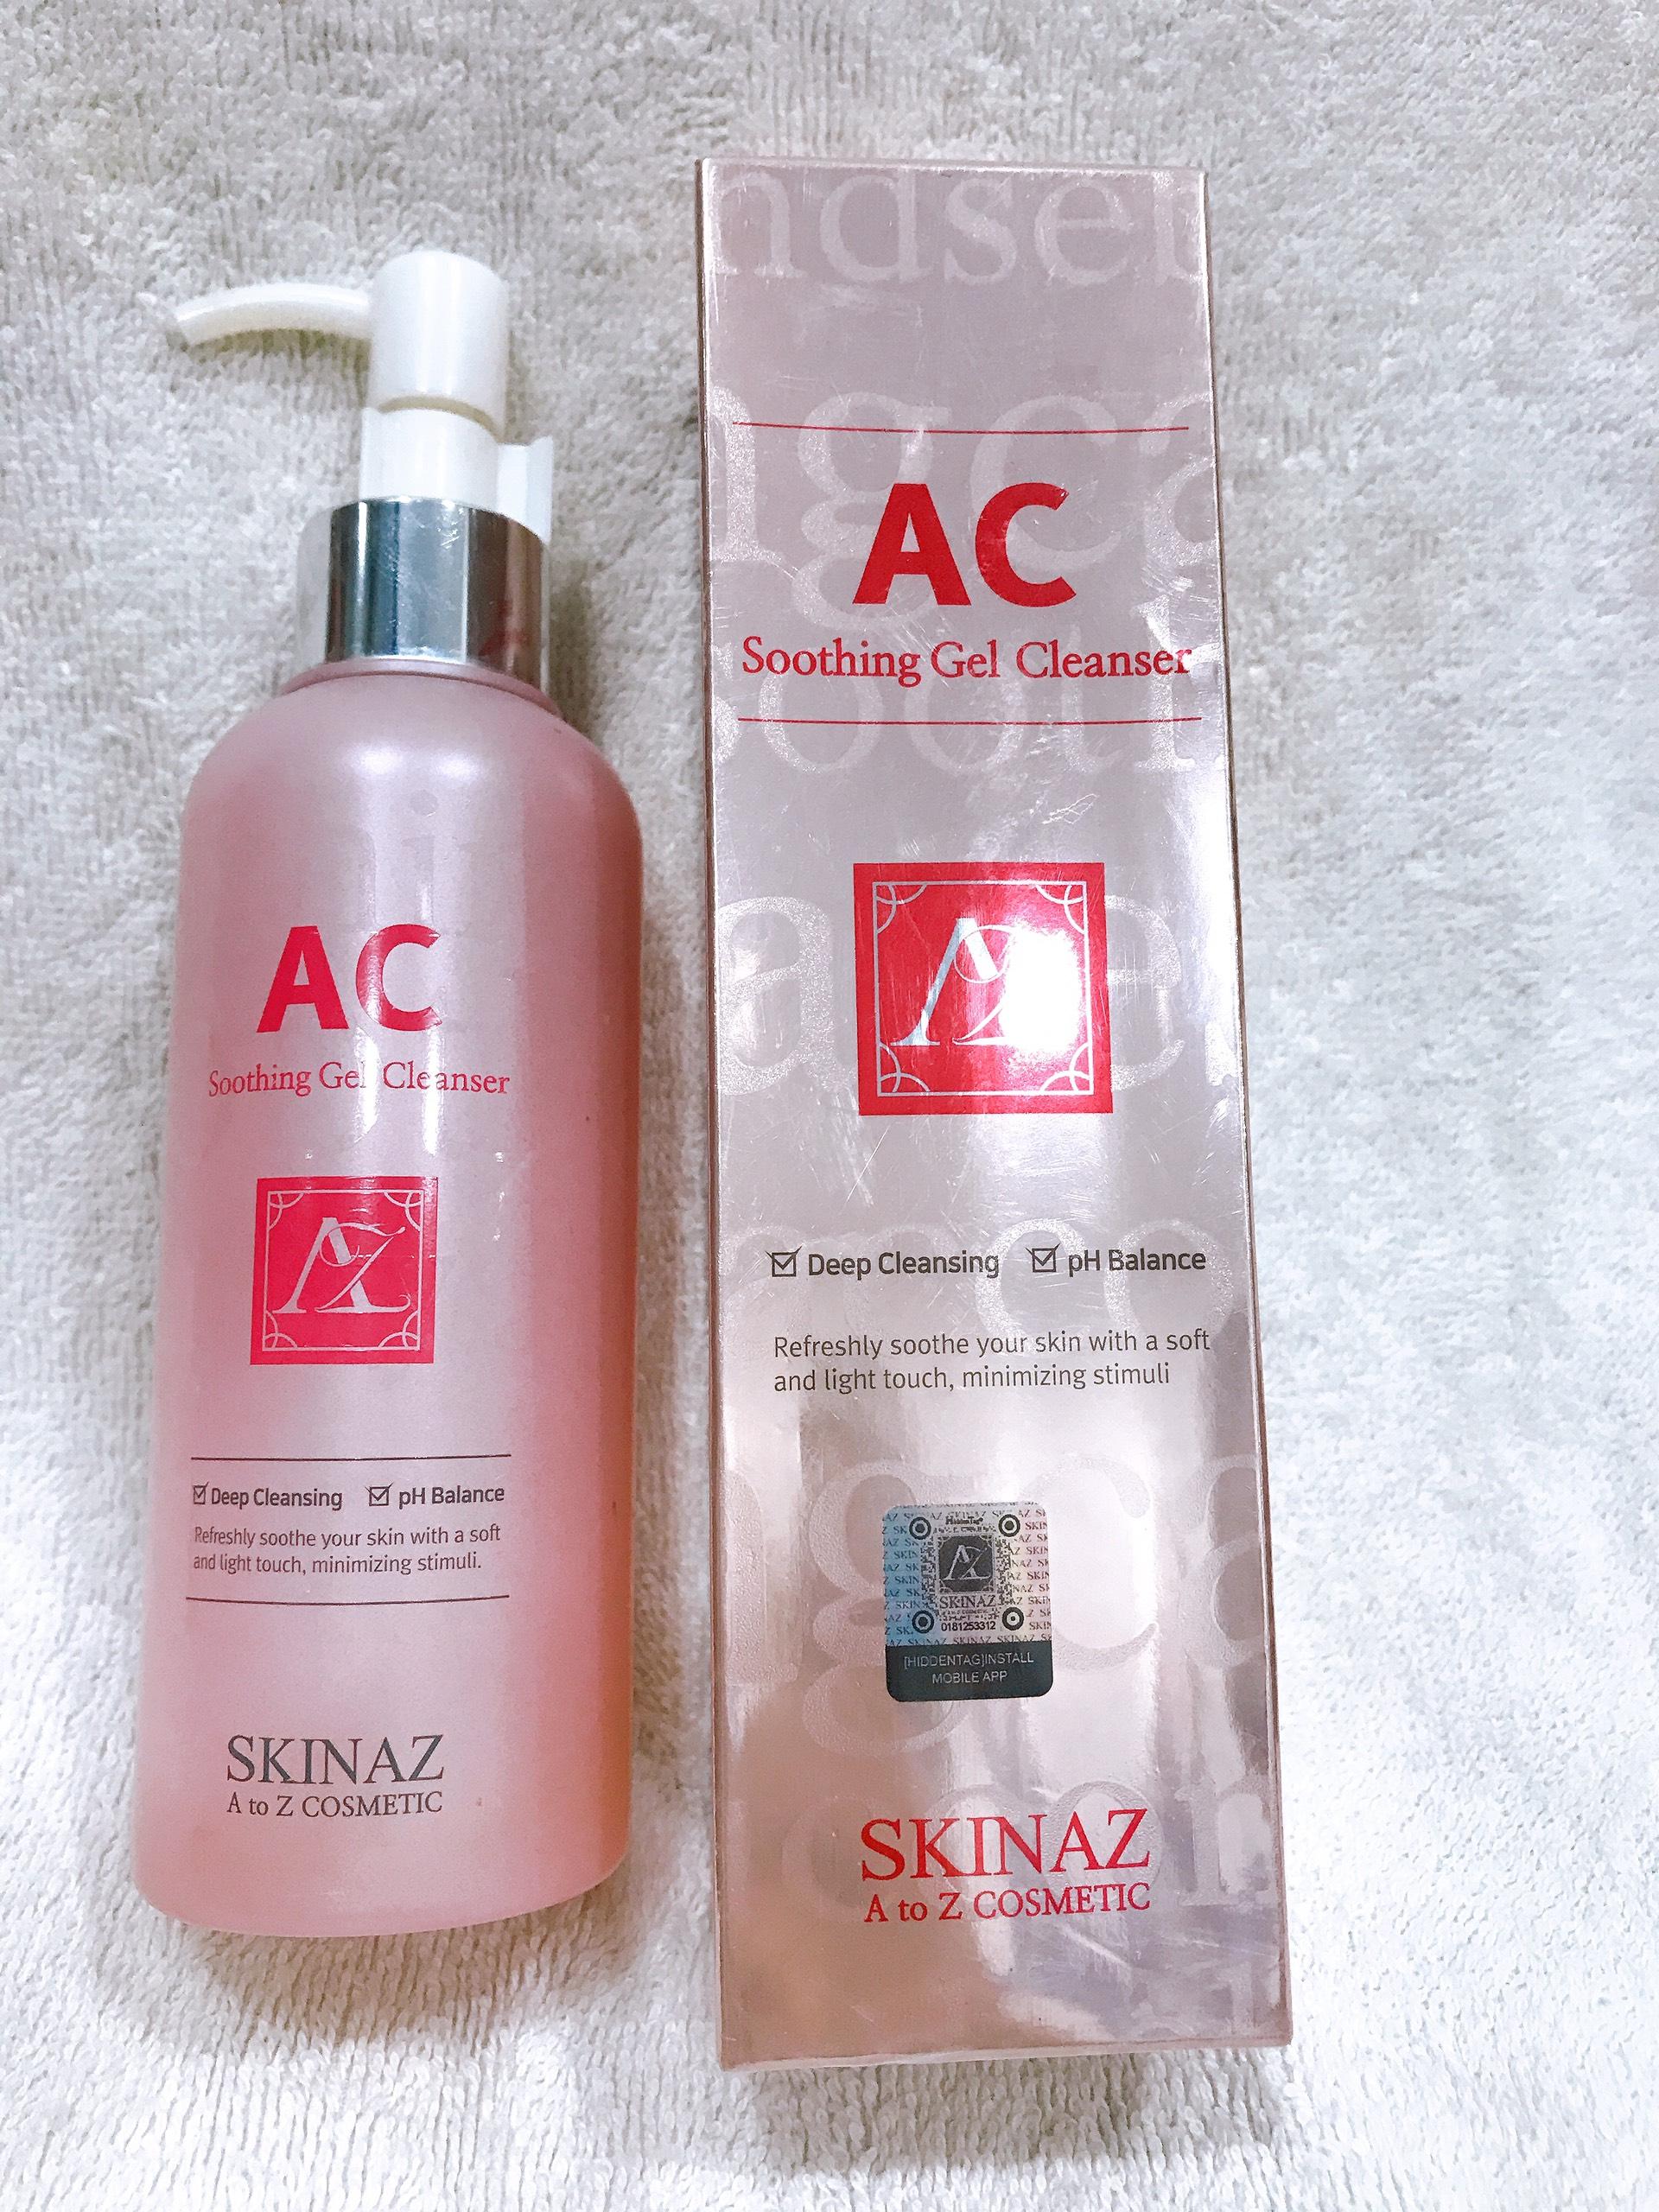 Sửa Rửa Mặt AC Skinaz Hàn Quốc mẫu 2020-180ml